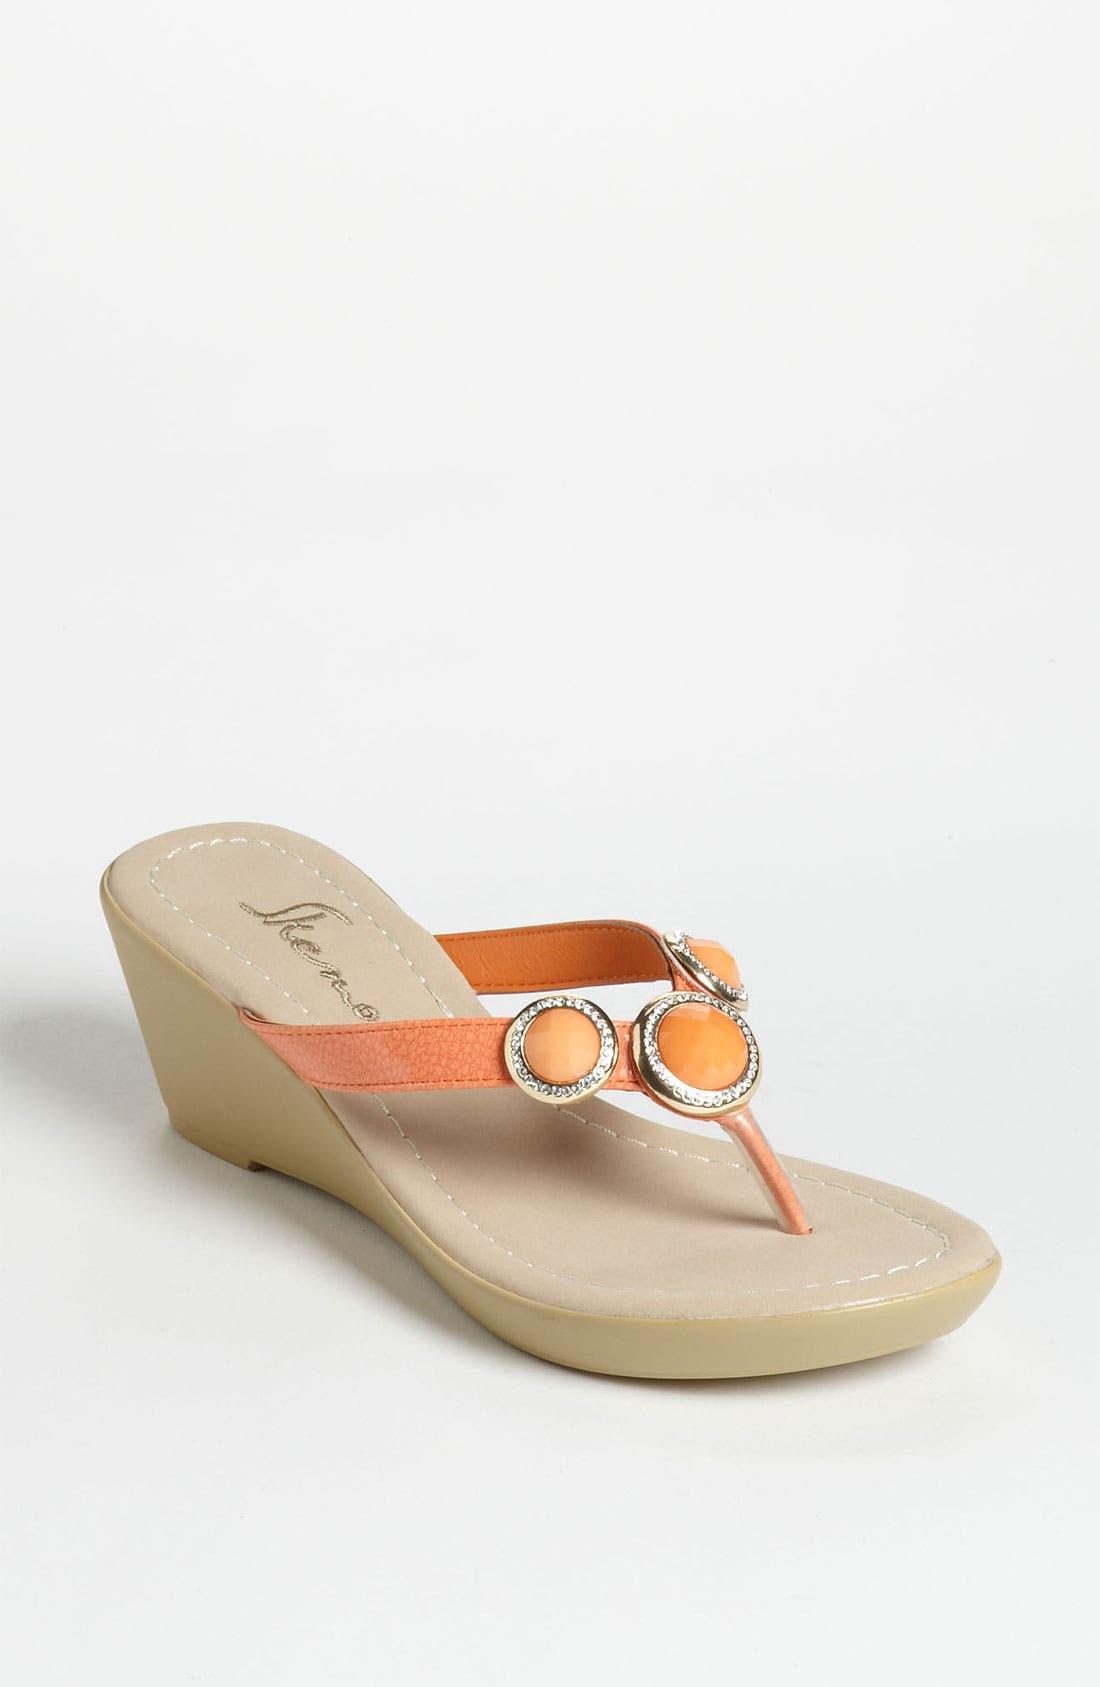 Main Image - Skemo 'Nash' Sandal